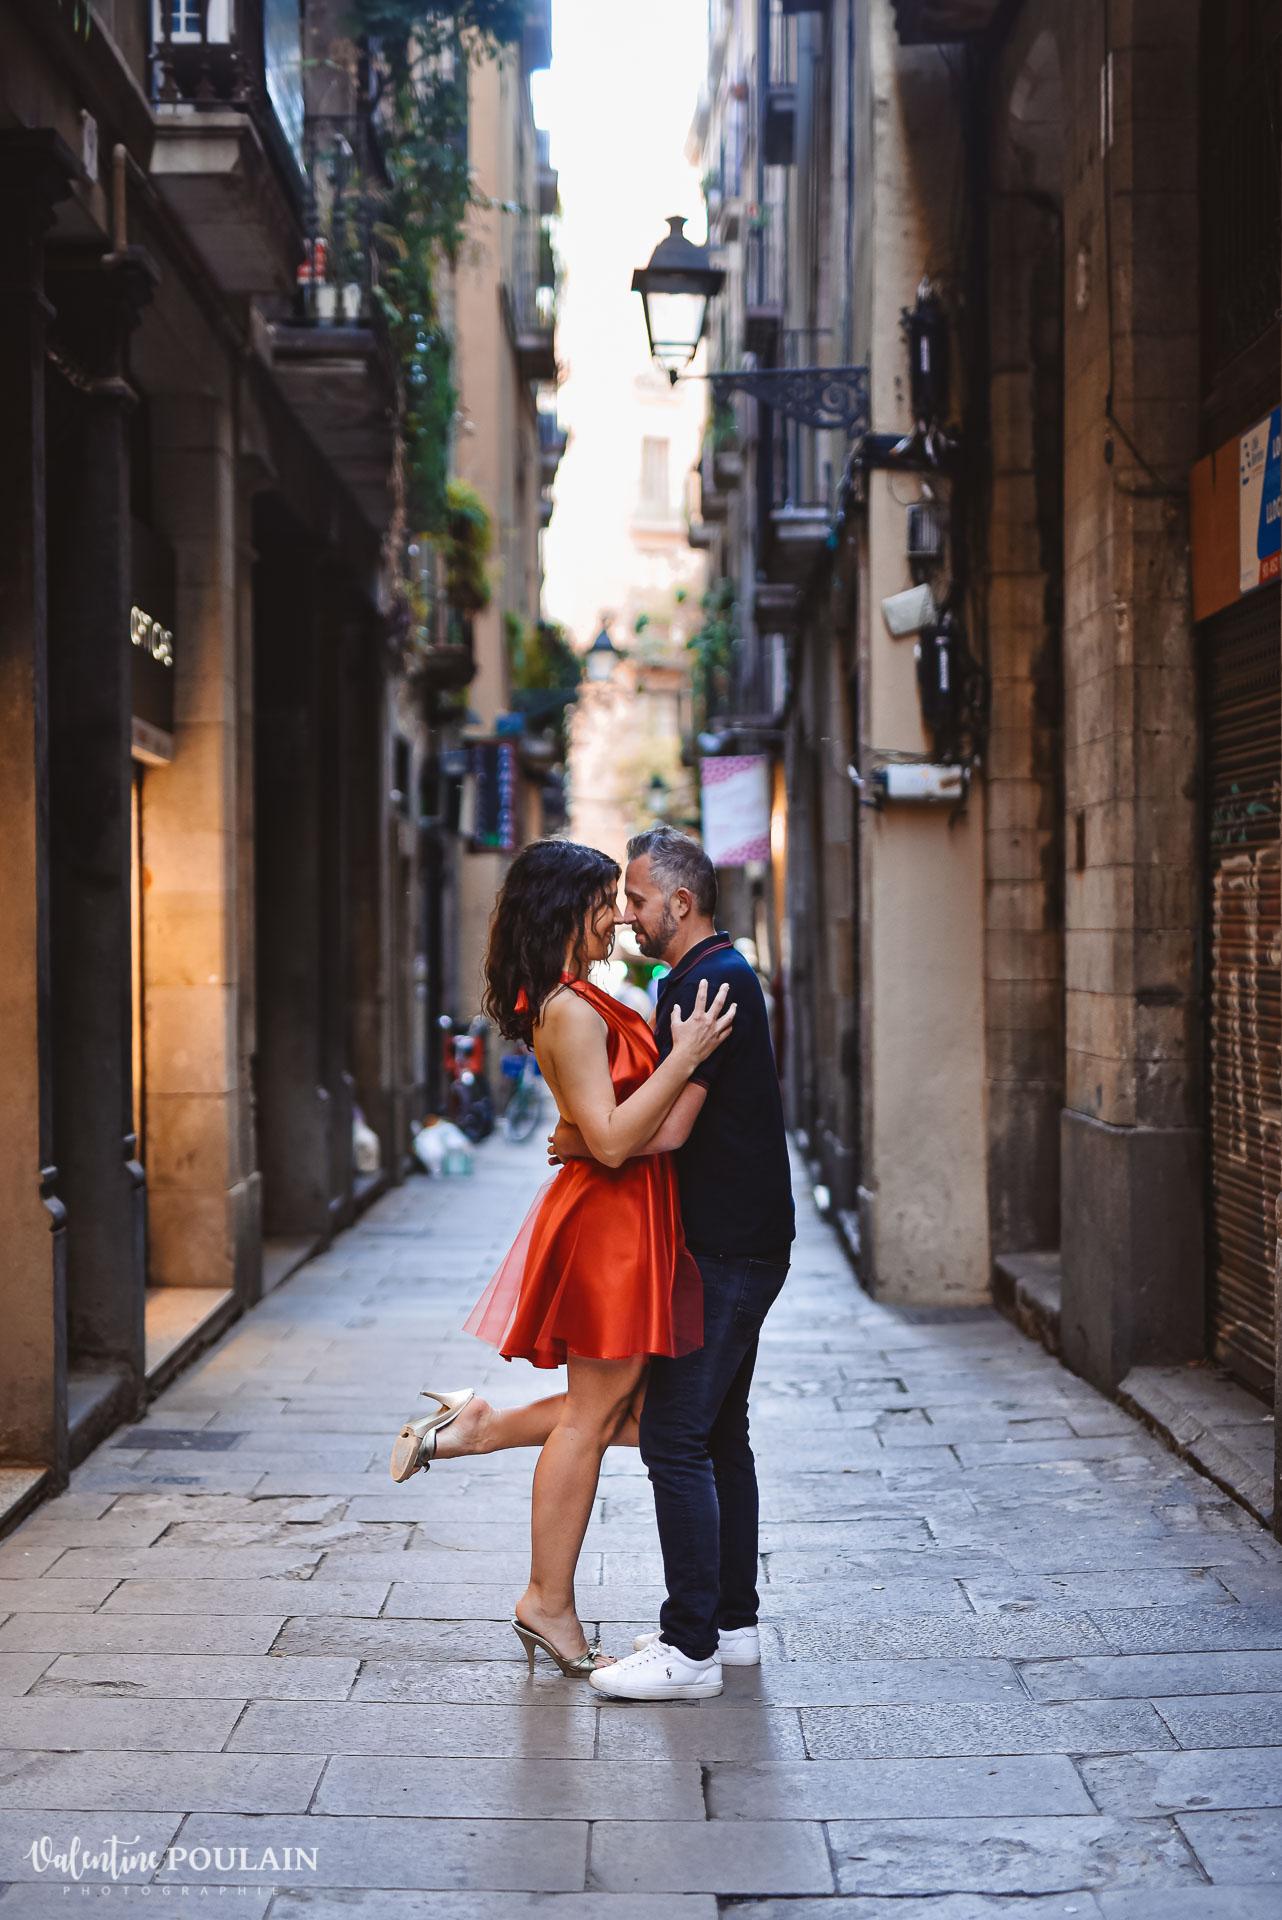 Séance photo couple Barcelone - Valentine Poulain jambe